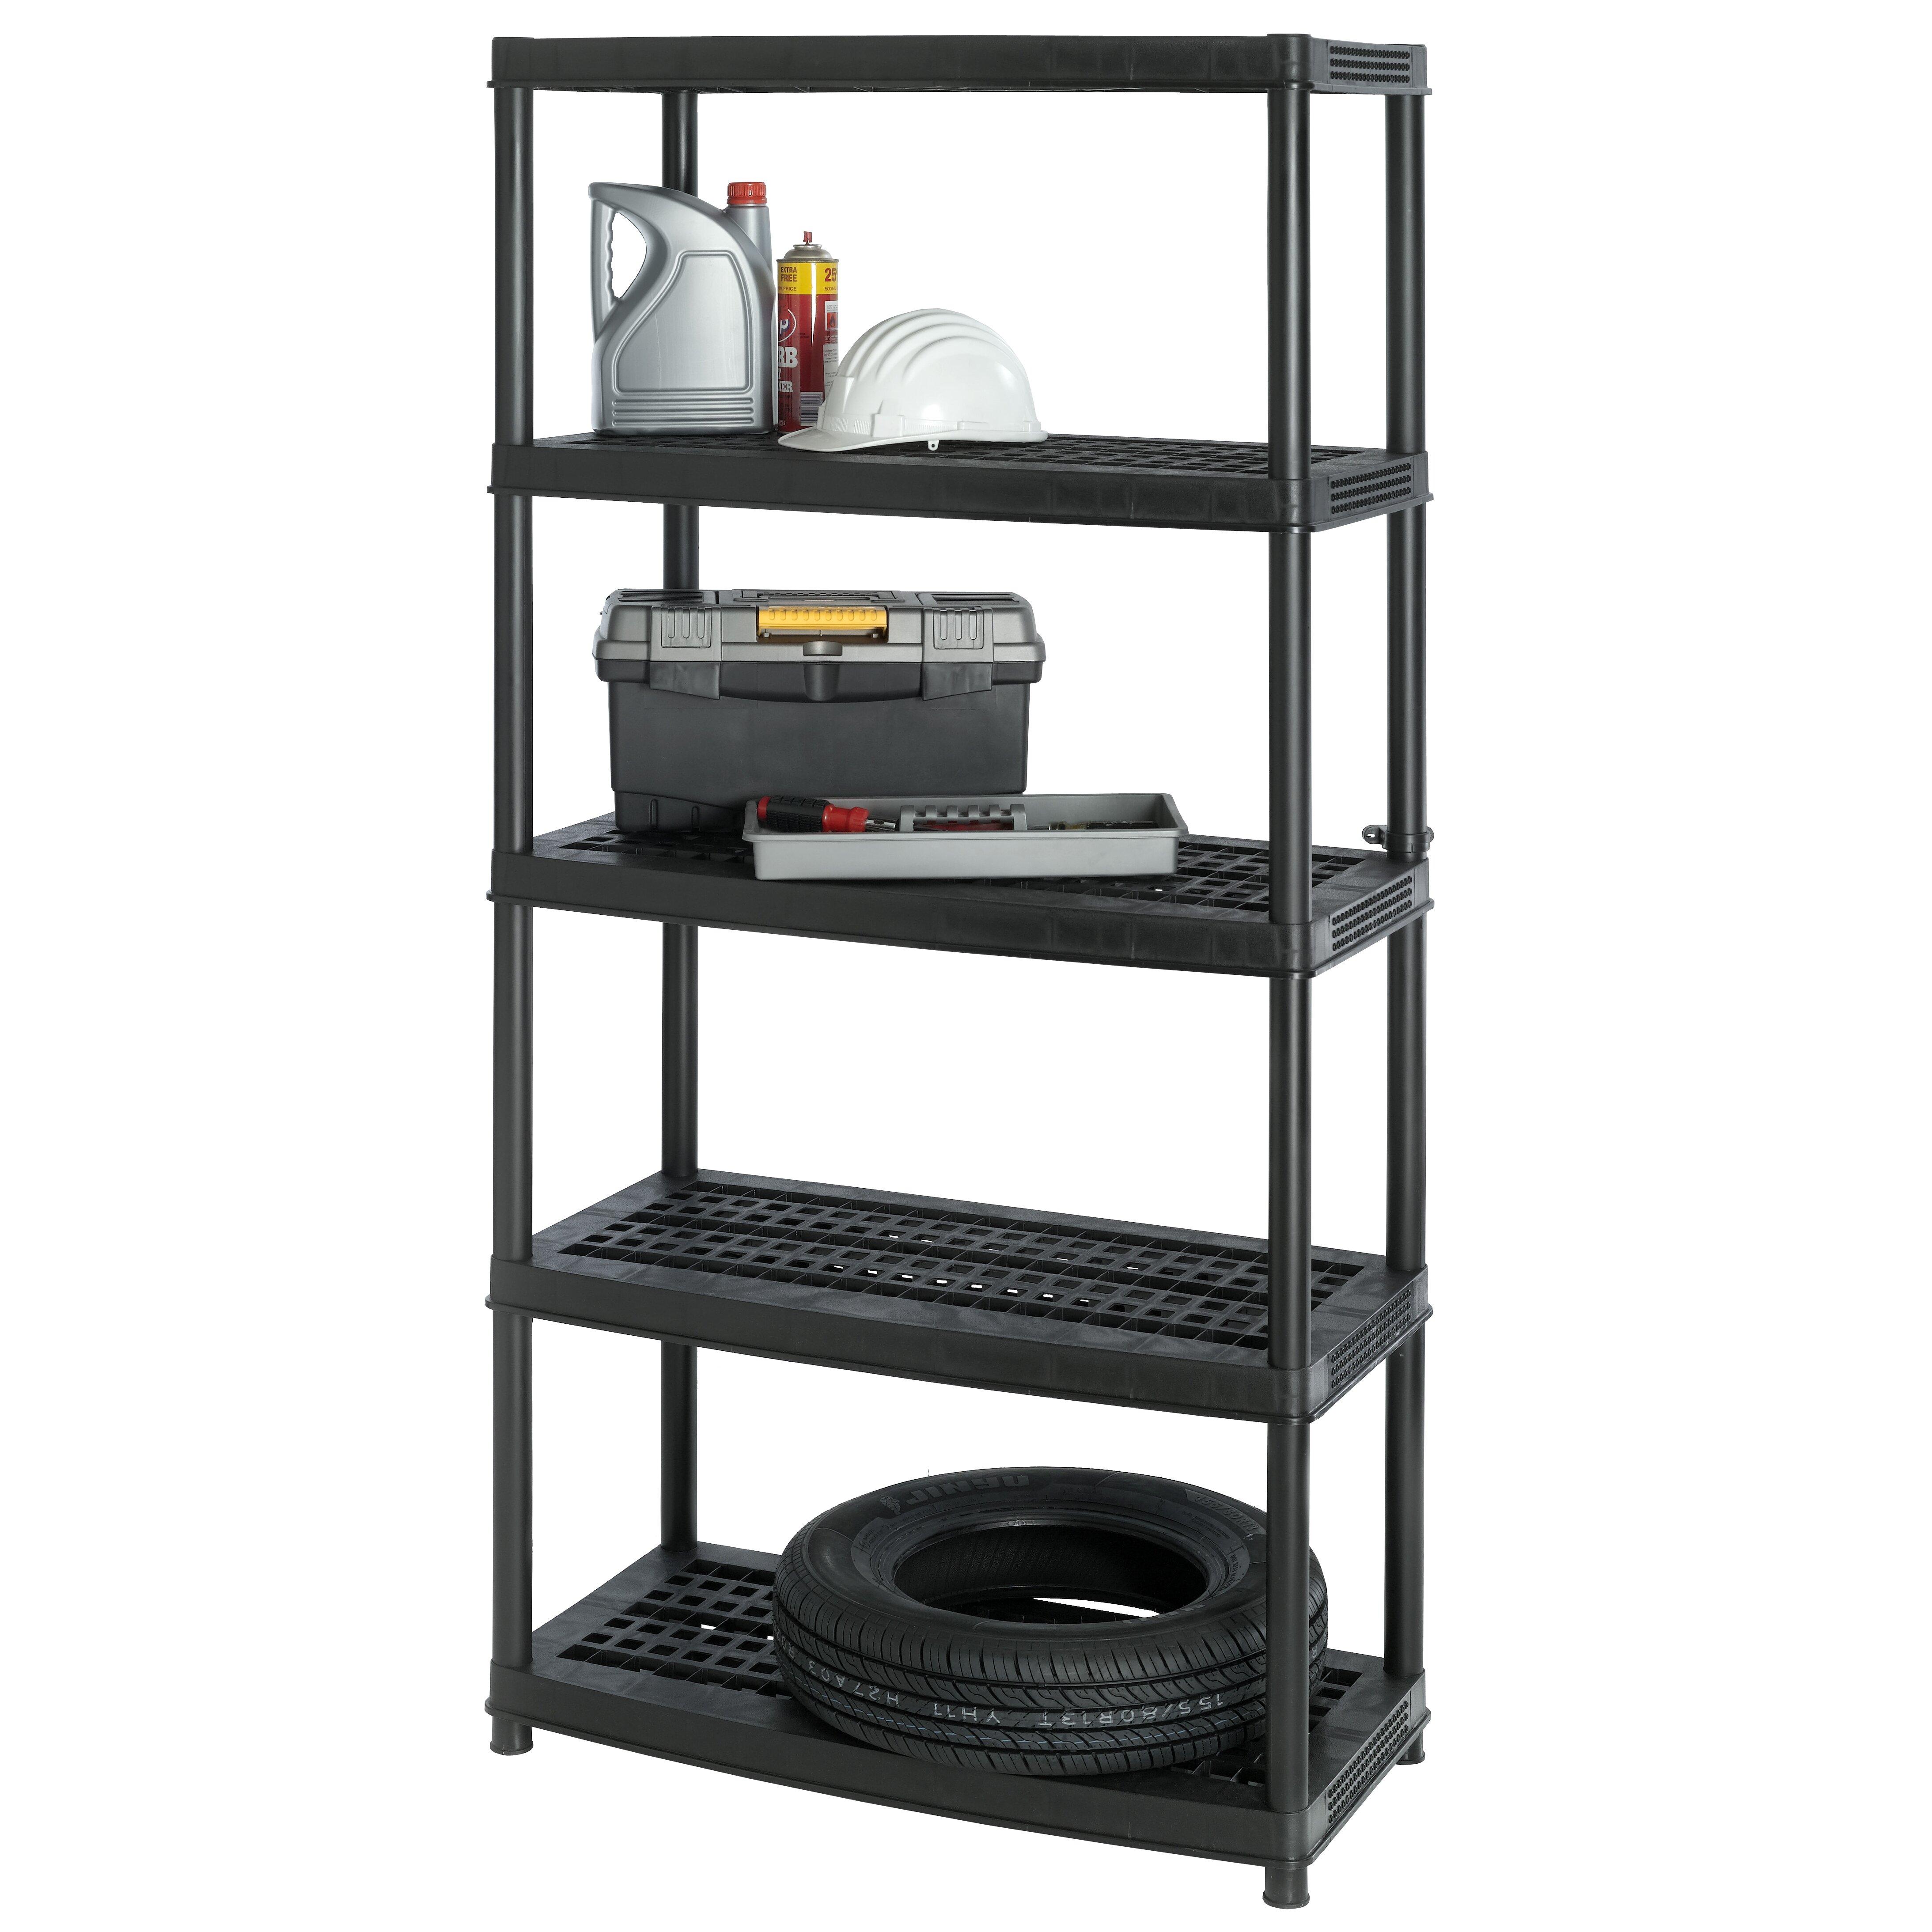 Keter Utility 72 Quot H Five Shelf Shelving Rack Unit